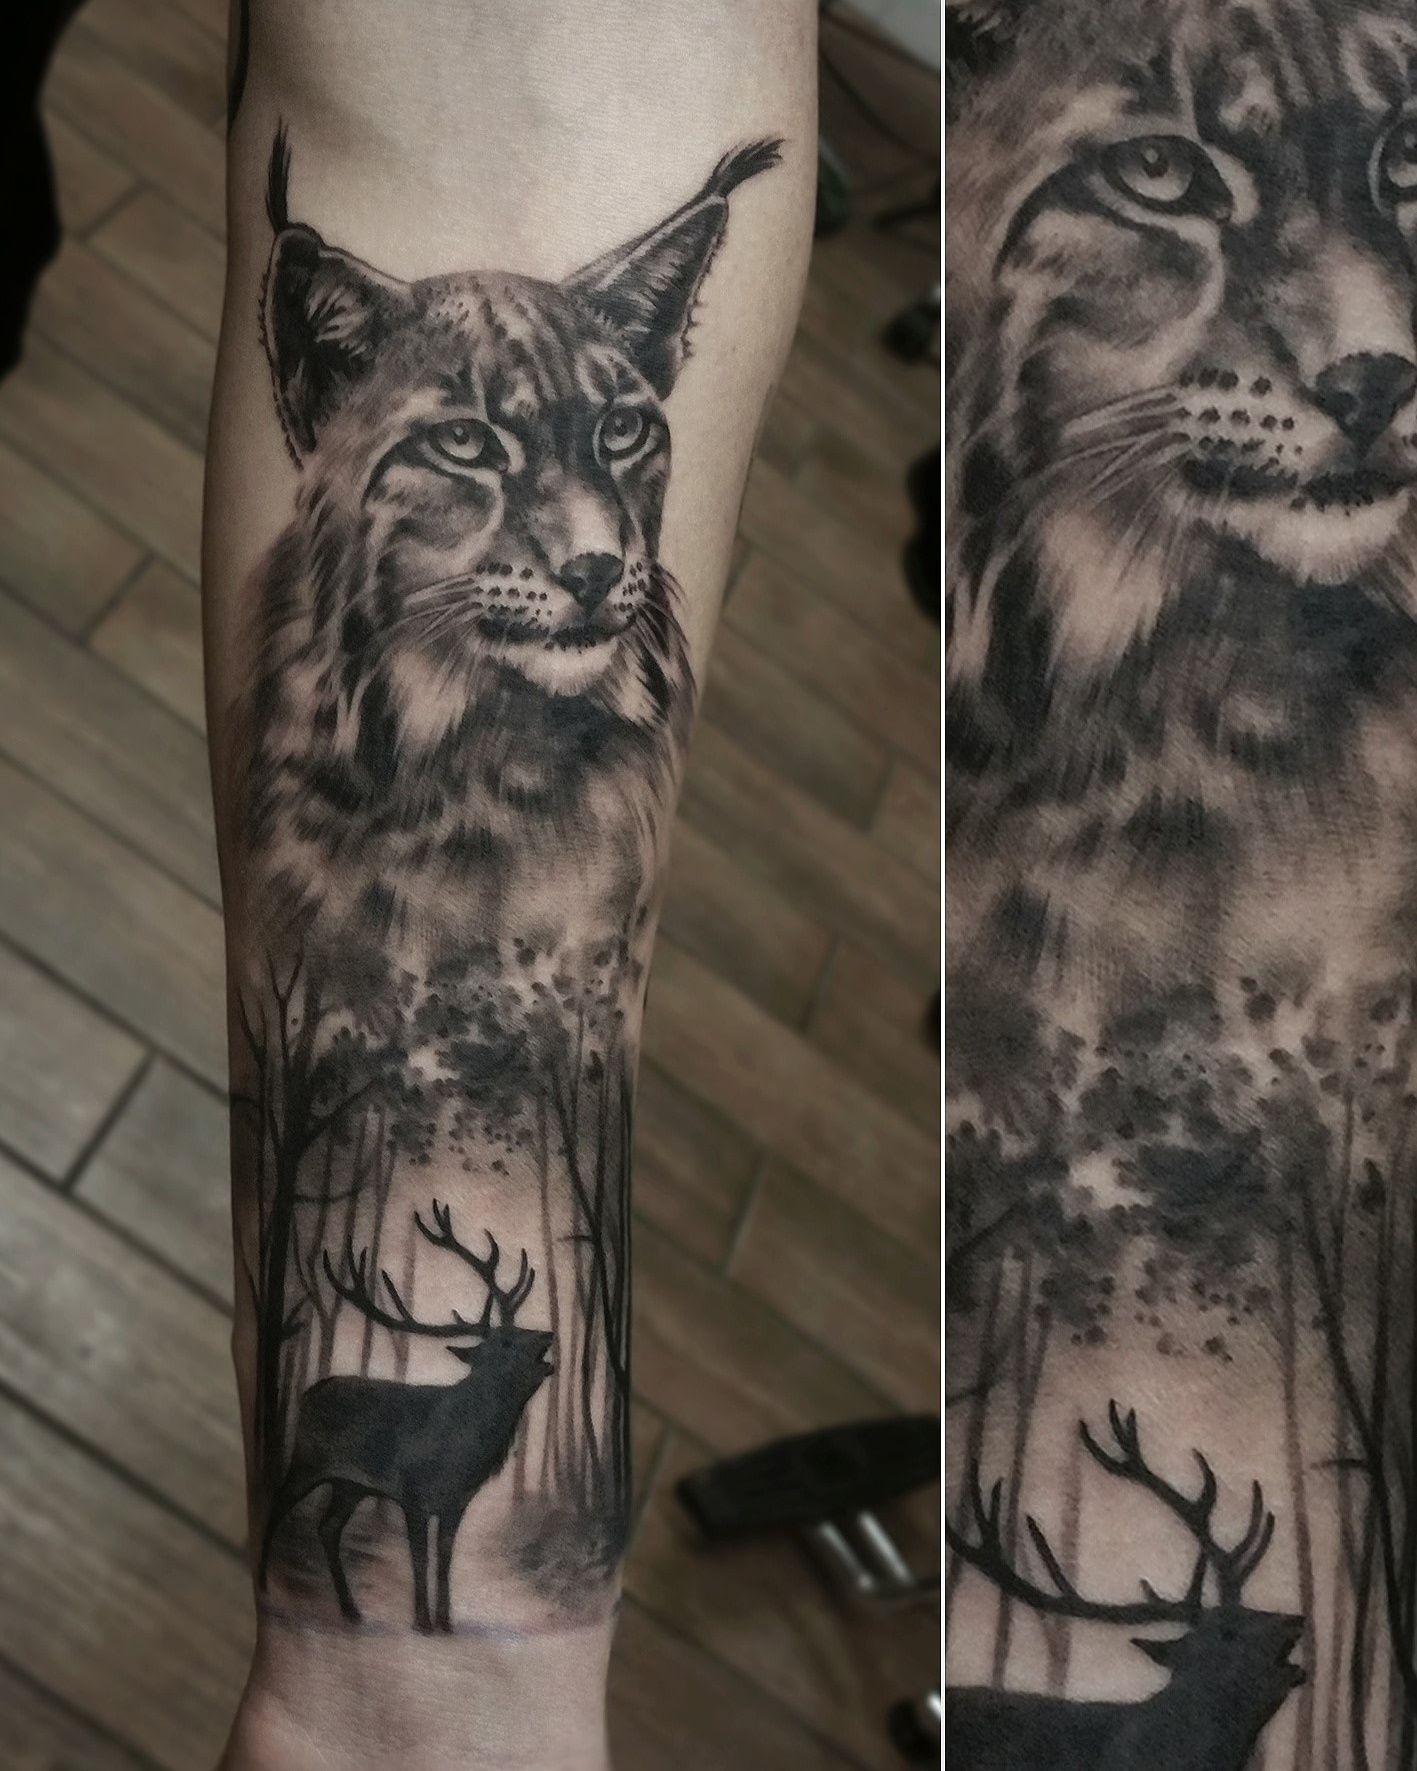 Black And Gray Full Sleeve In Progress Artist Janis Svars Lynx Lynxtattoo Tattoo Deer Animal Animaltatto Animal Tattoos Tattoos For Guys Wildlife Tattoo